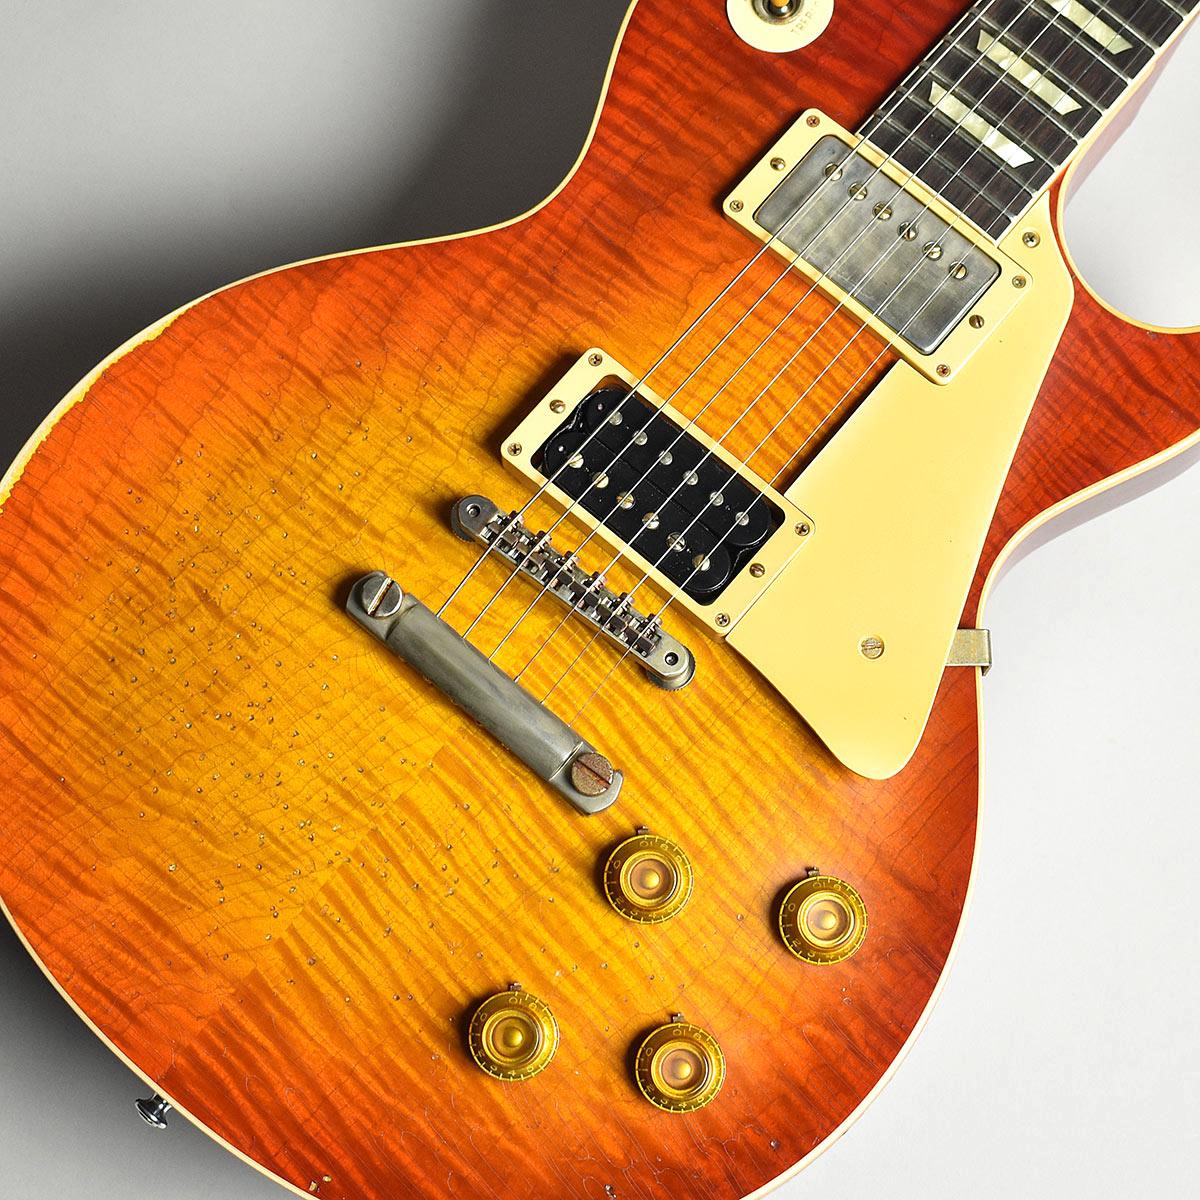 Gibson Custom S/N:91262【ギブソン Shop 1959 Les Paul Standard BOTB Aged First Standard Tom Murphy Painted & Aged S/N:91262【ギブソン カスタムショップ】【現地選定品】【未展示品】, ドラゴンスター:9a204420 --- sunward.msk.ru